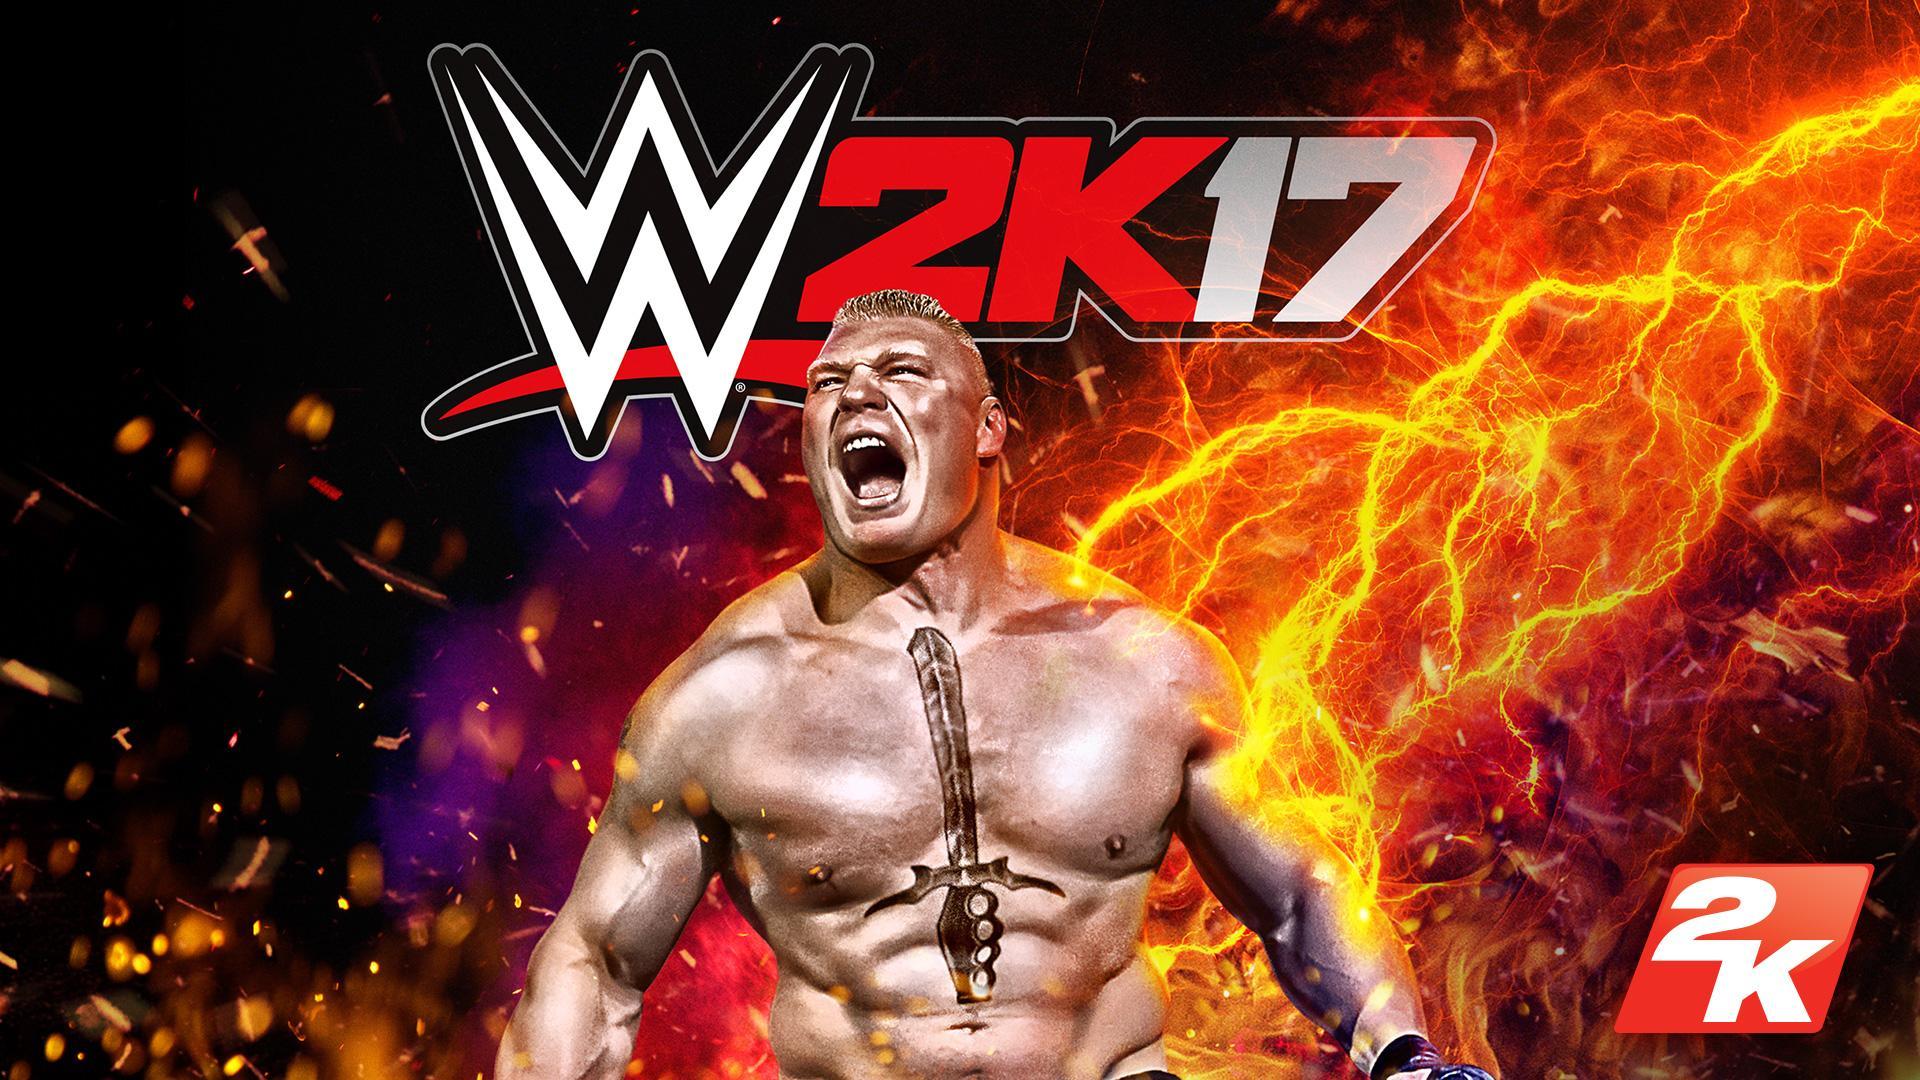 WWE 2K17 Wallpapers & Artworks